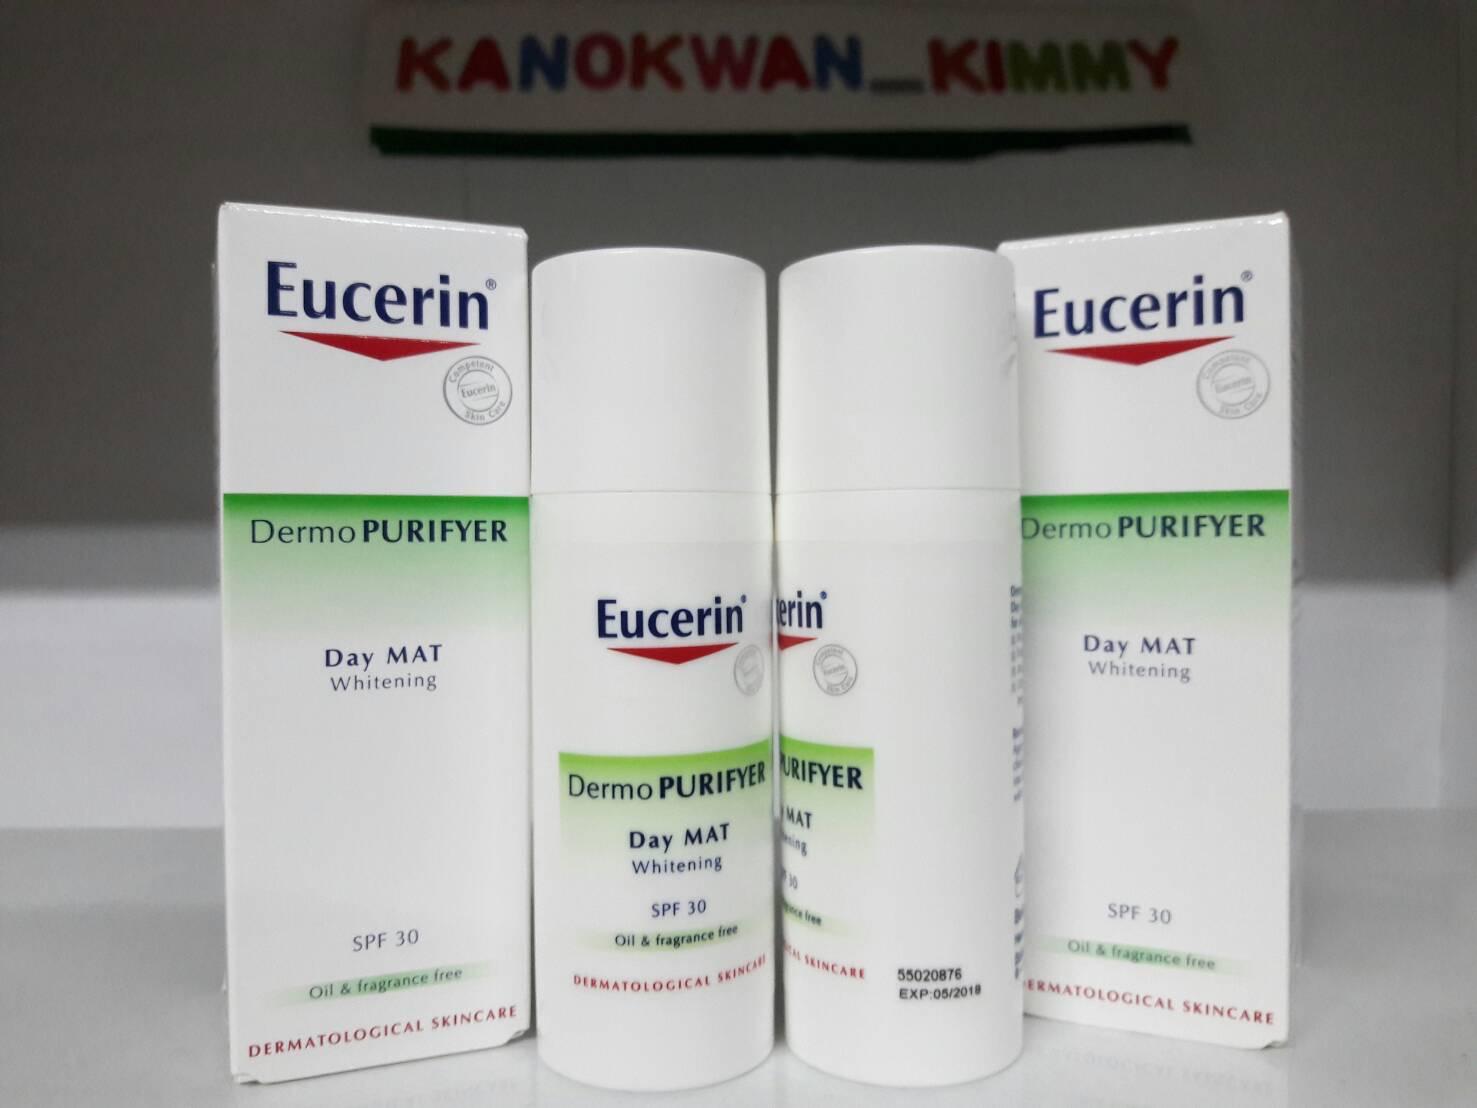 #Eucerin DermoPURIFYER Day Mat Whitening SPF30 (50ml.) แพ็คคู่